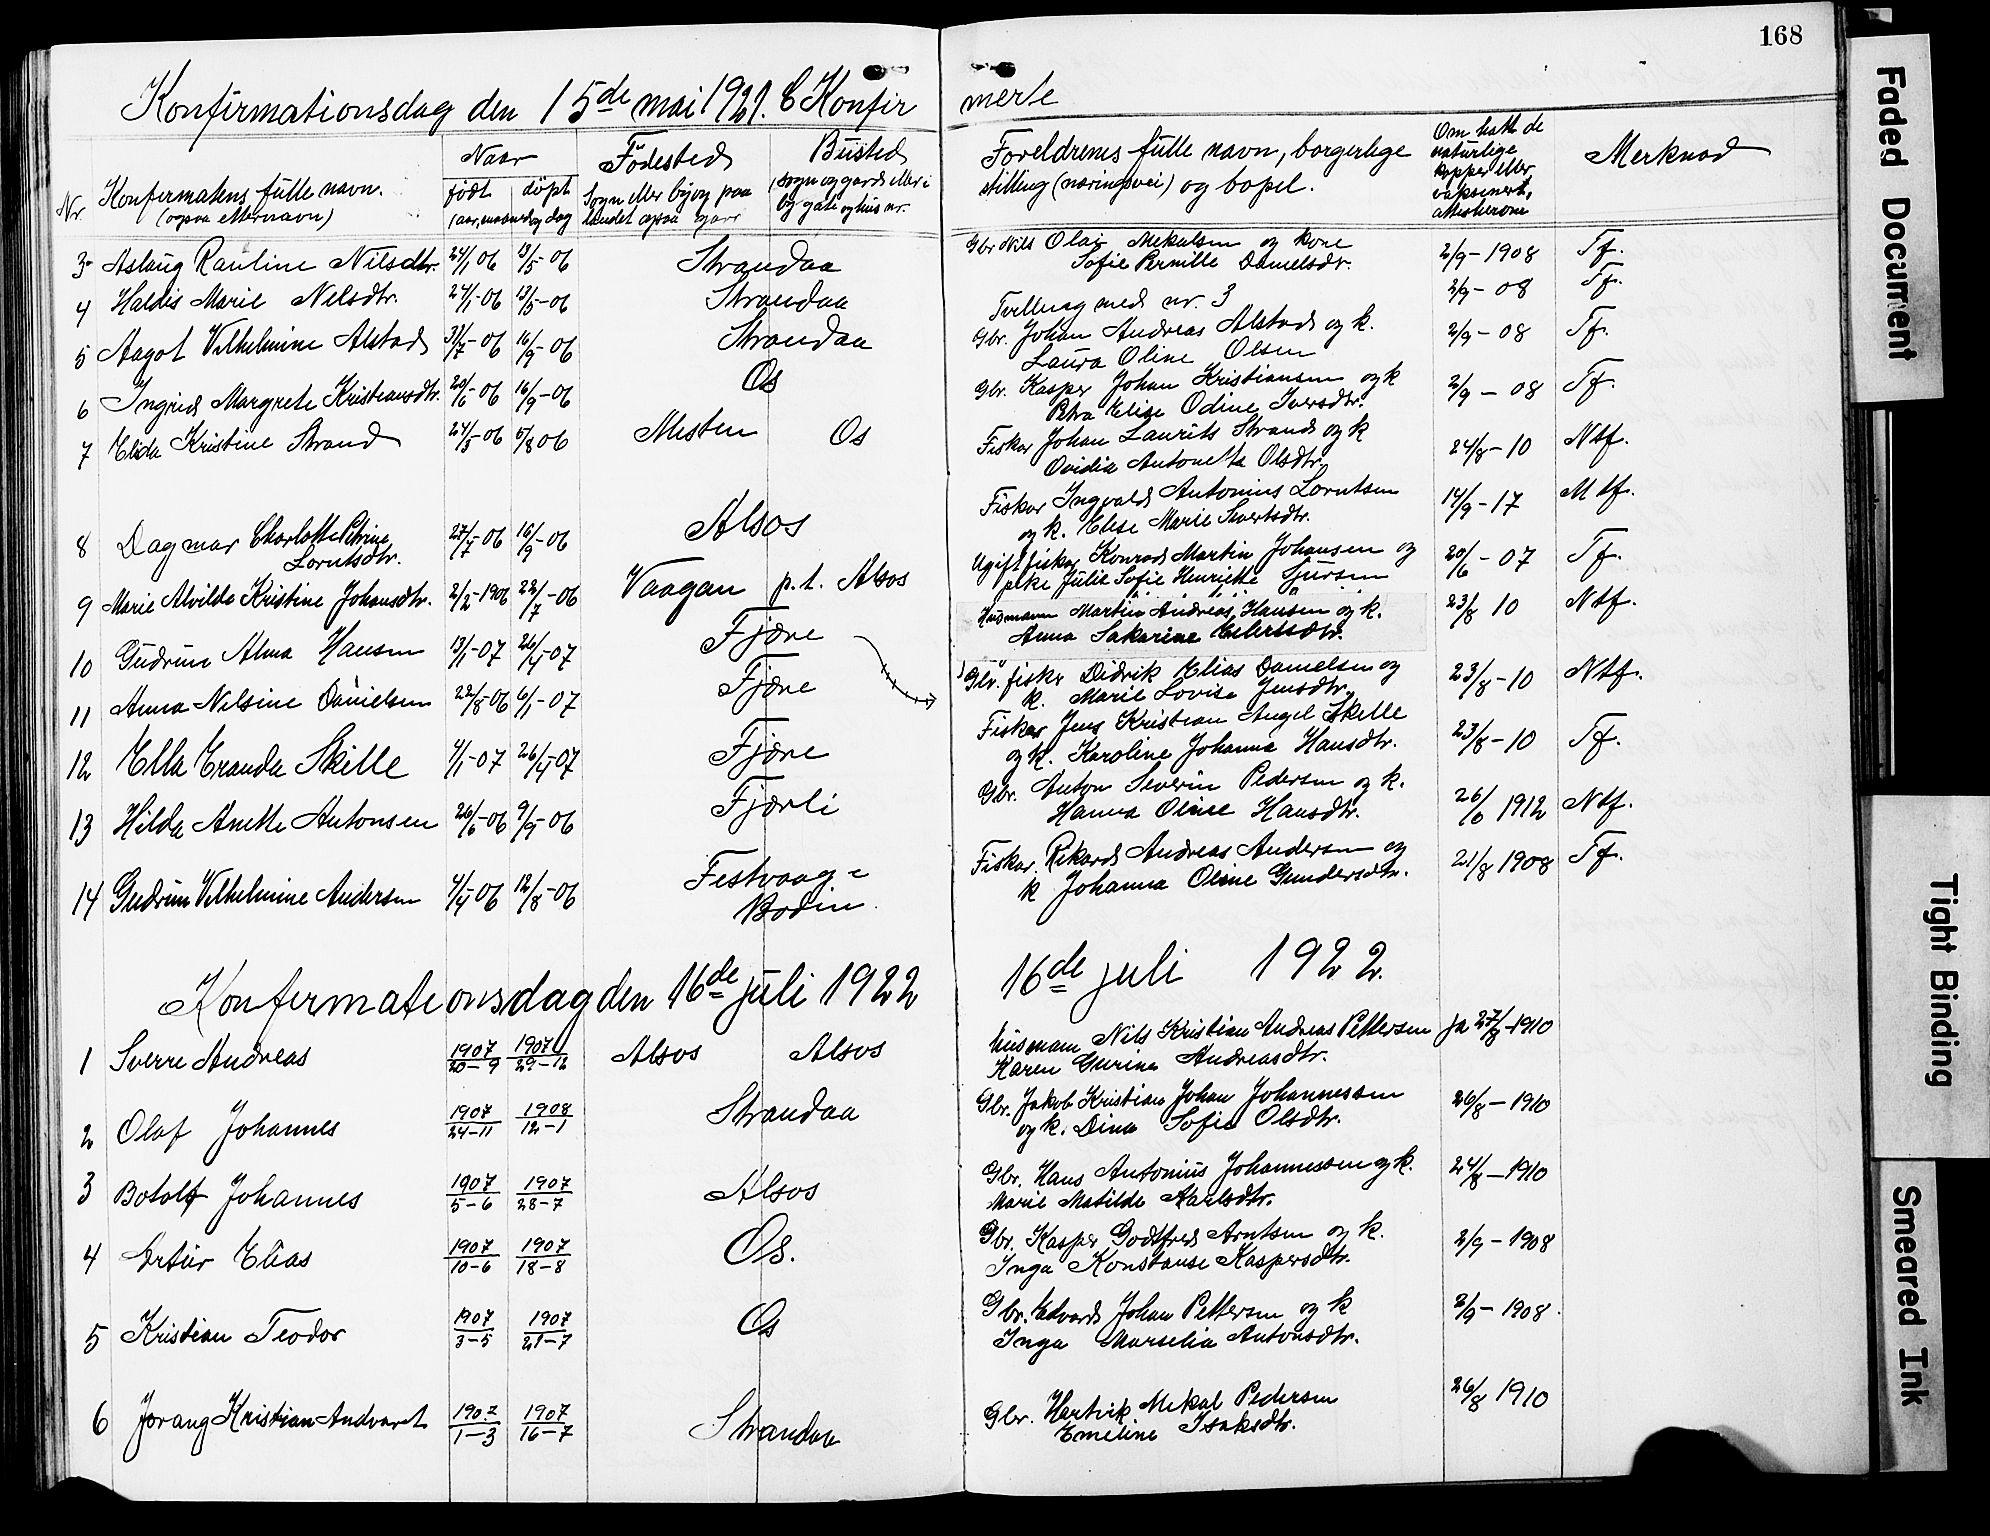 SAT, Ministerialprotokoller, klokkerbøker og fødselsregistre - Nordland, 803/L0077: Klokkerbok nr. 803C04, 1897-1930, s. 168